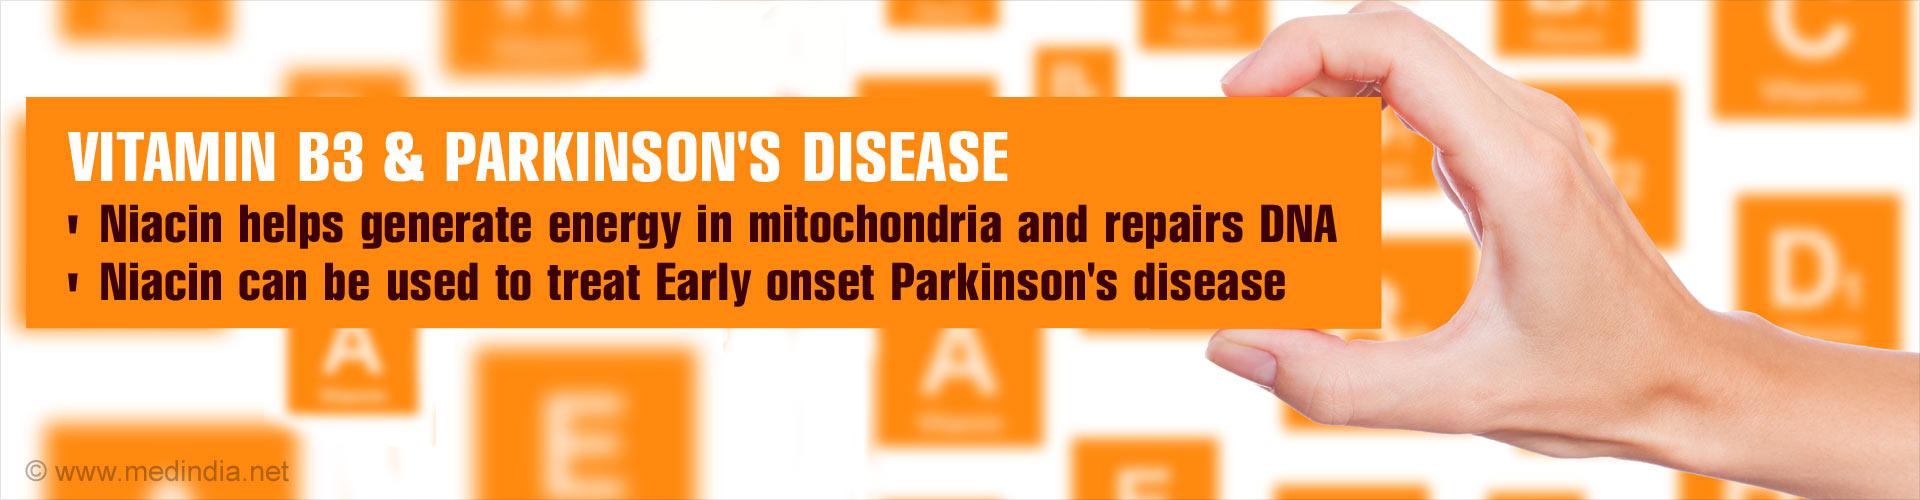 Niacin May Help Treat Early-onset Parkinson's Disease